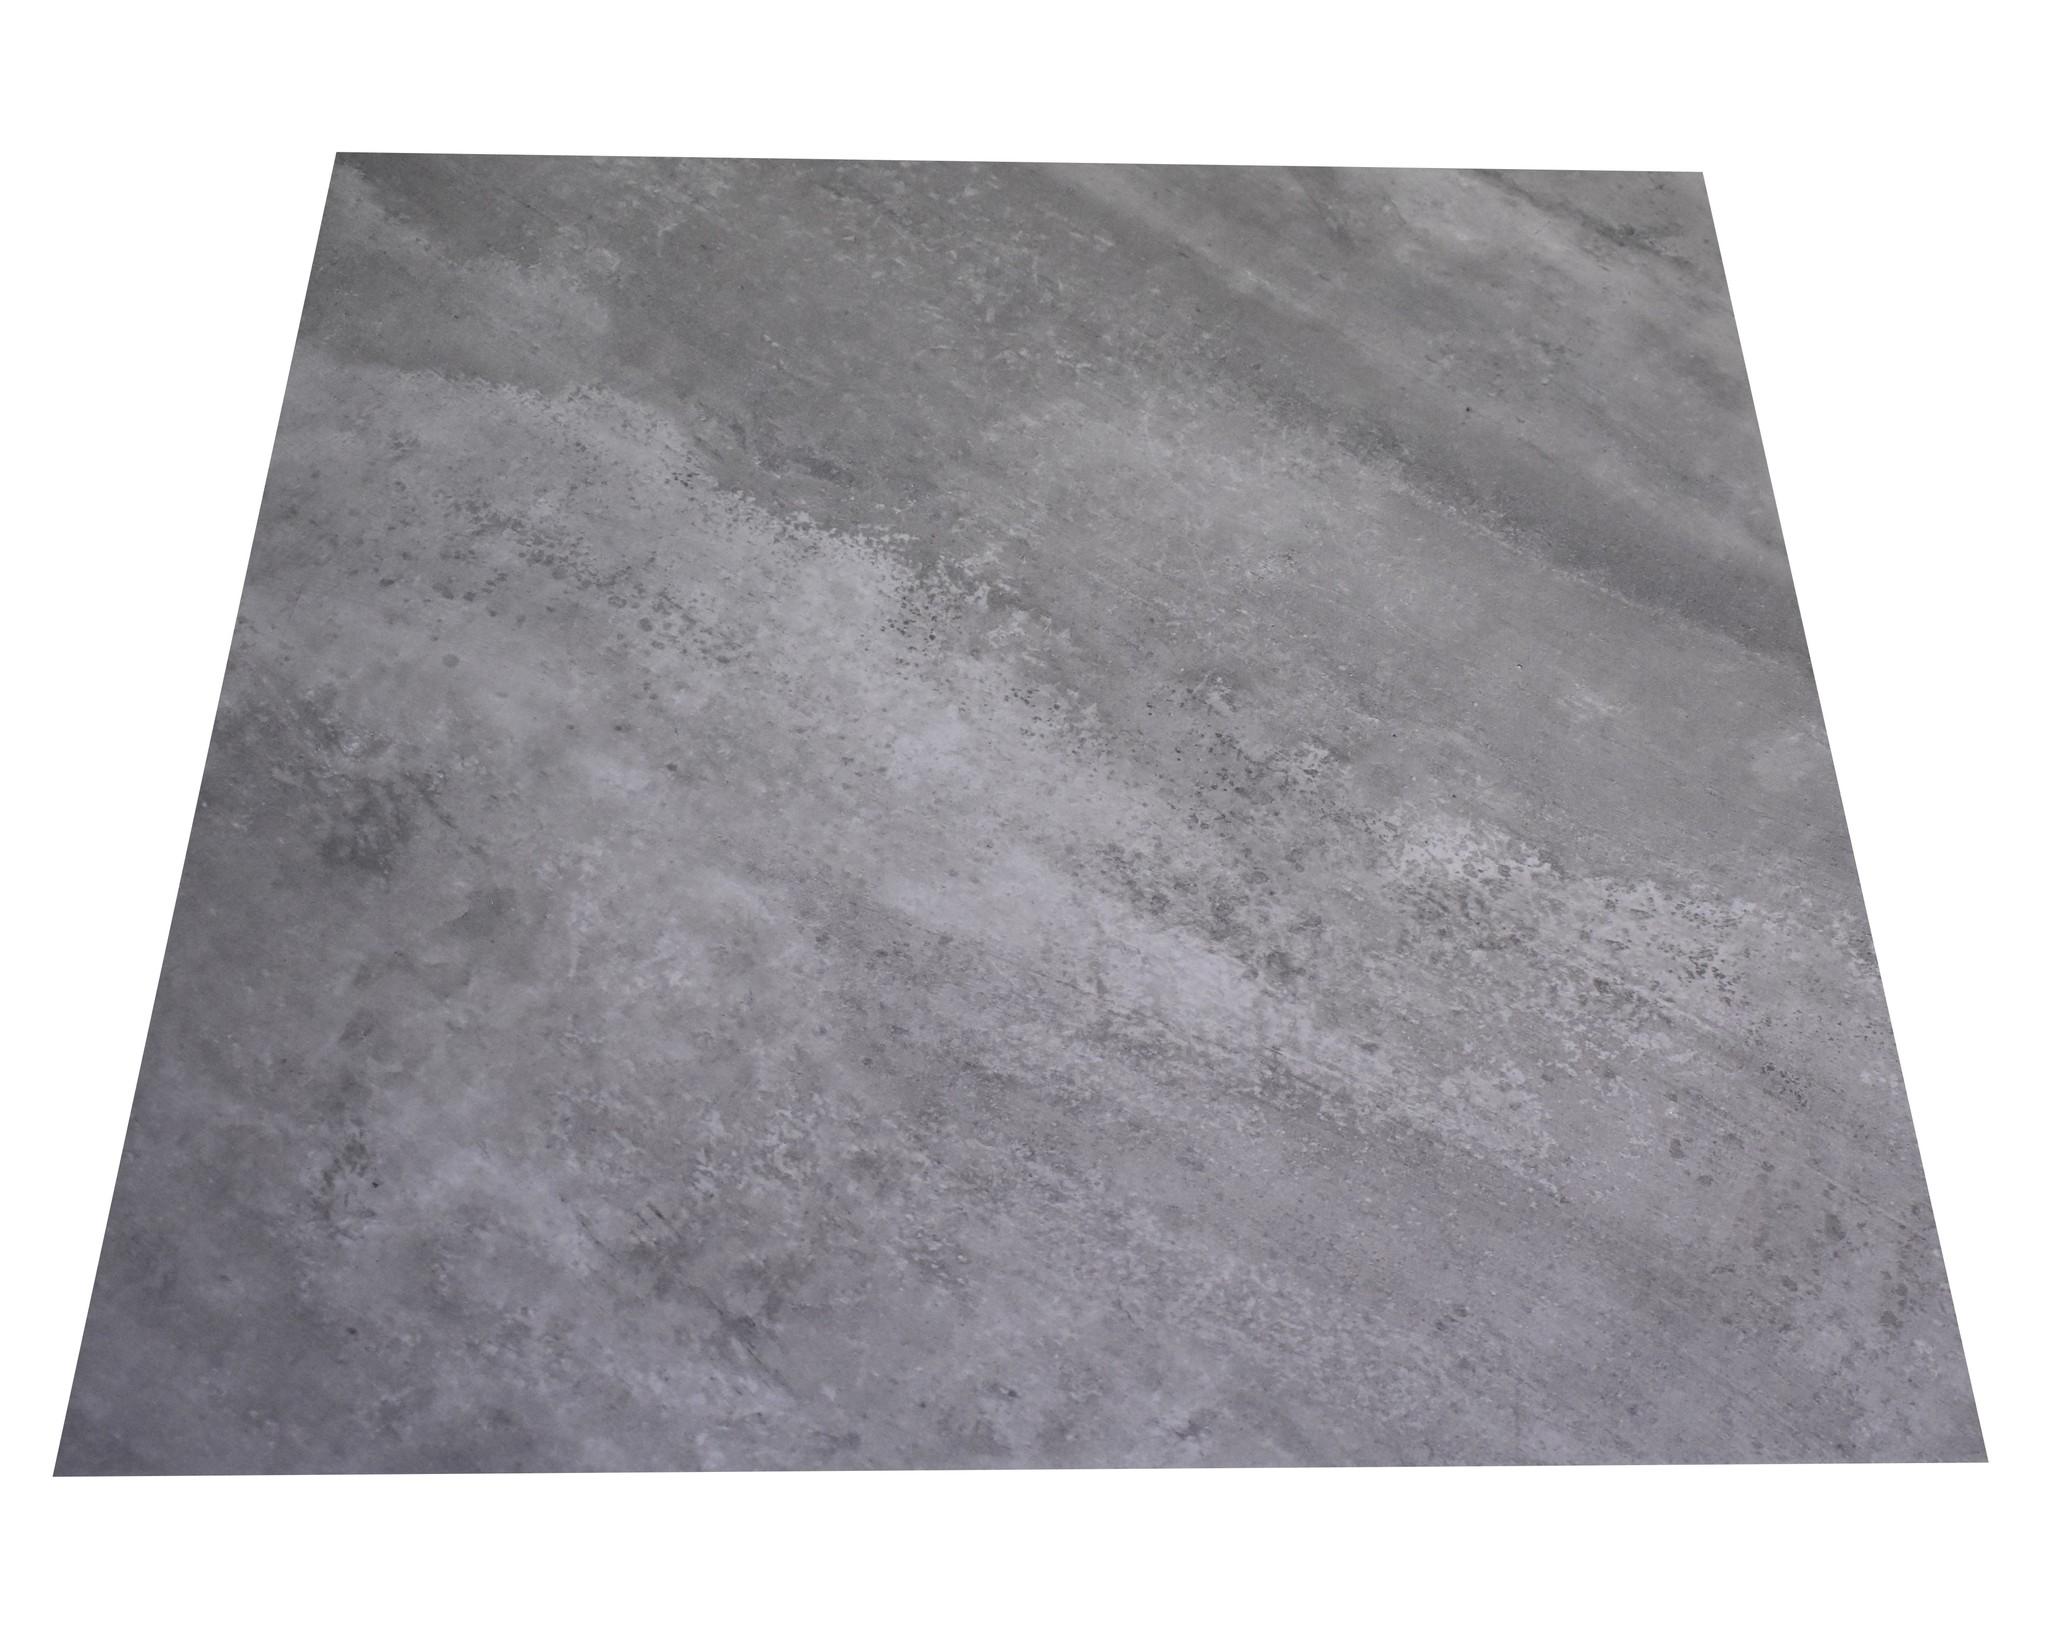 Concrete Grau Bodenfliesen